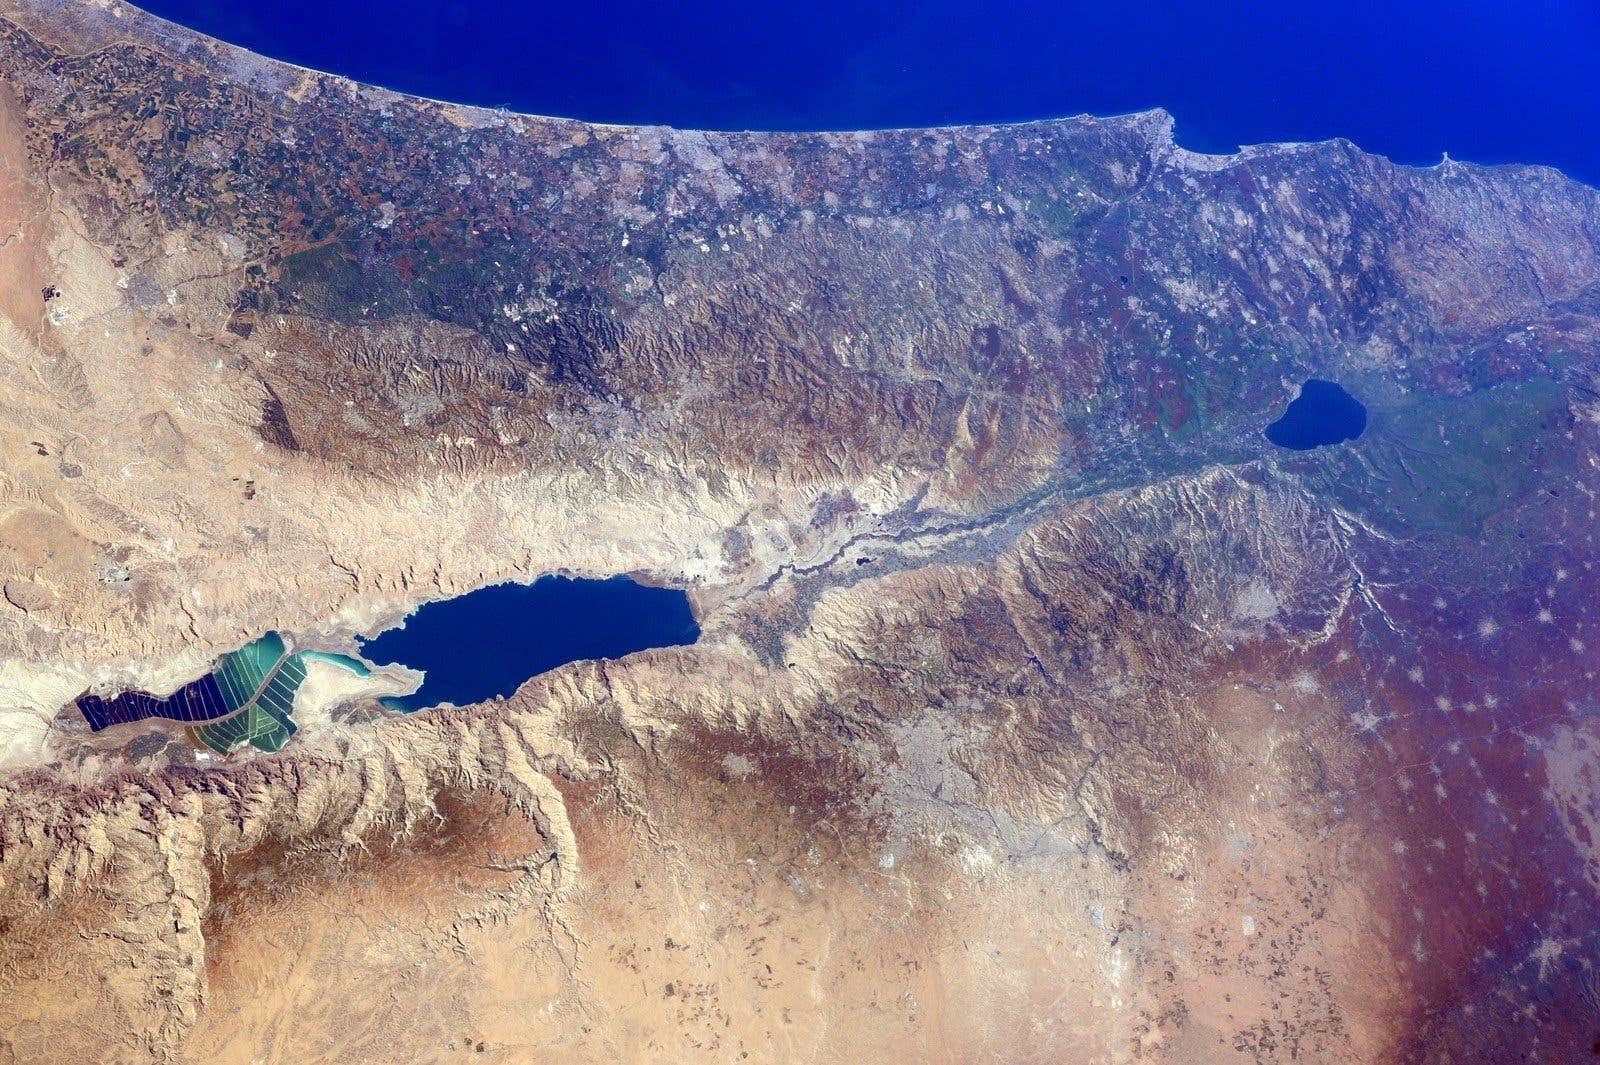 Photo courtesy: NASA/Barry Wilmore nasa dead sea palestine israel